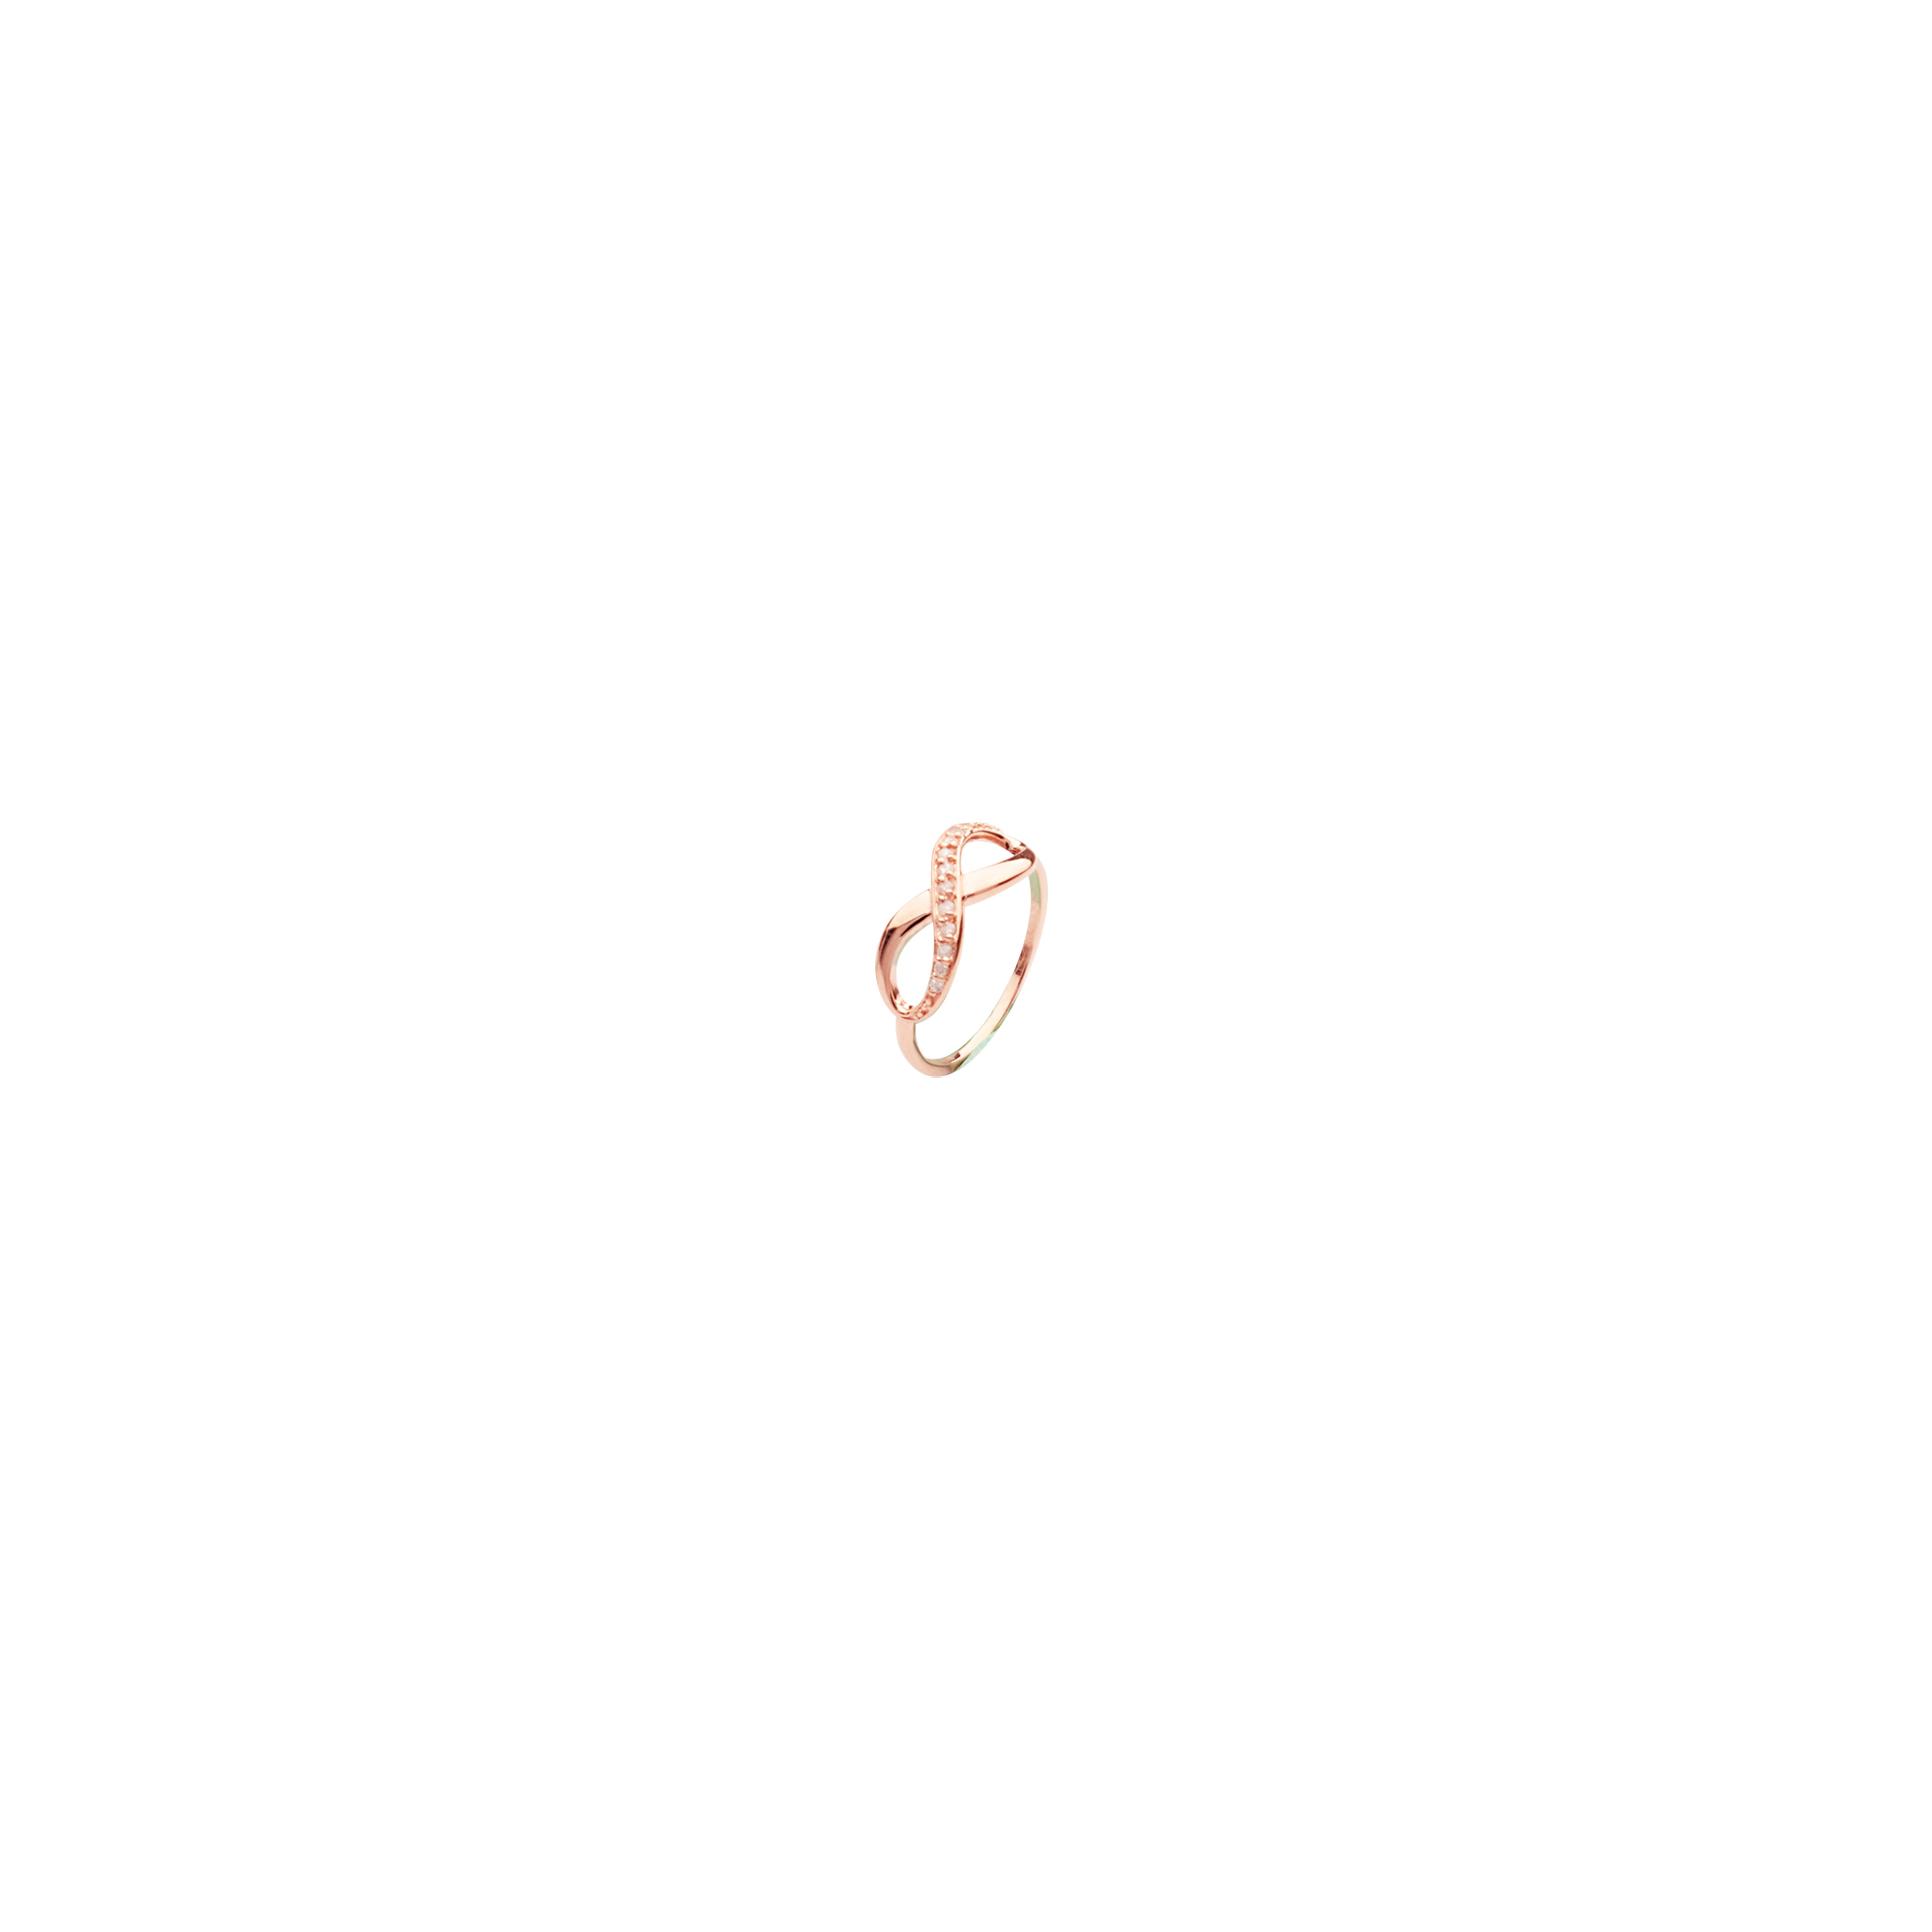 E2W 1/2-Carat Cubuc Zircon Infinity Ring